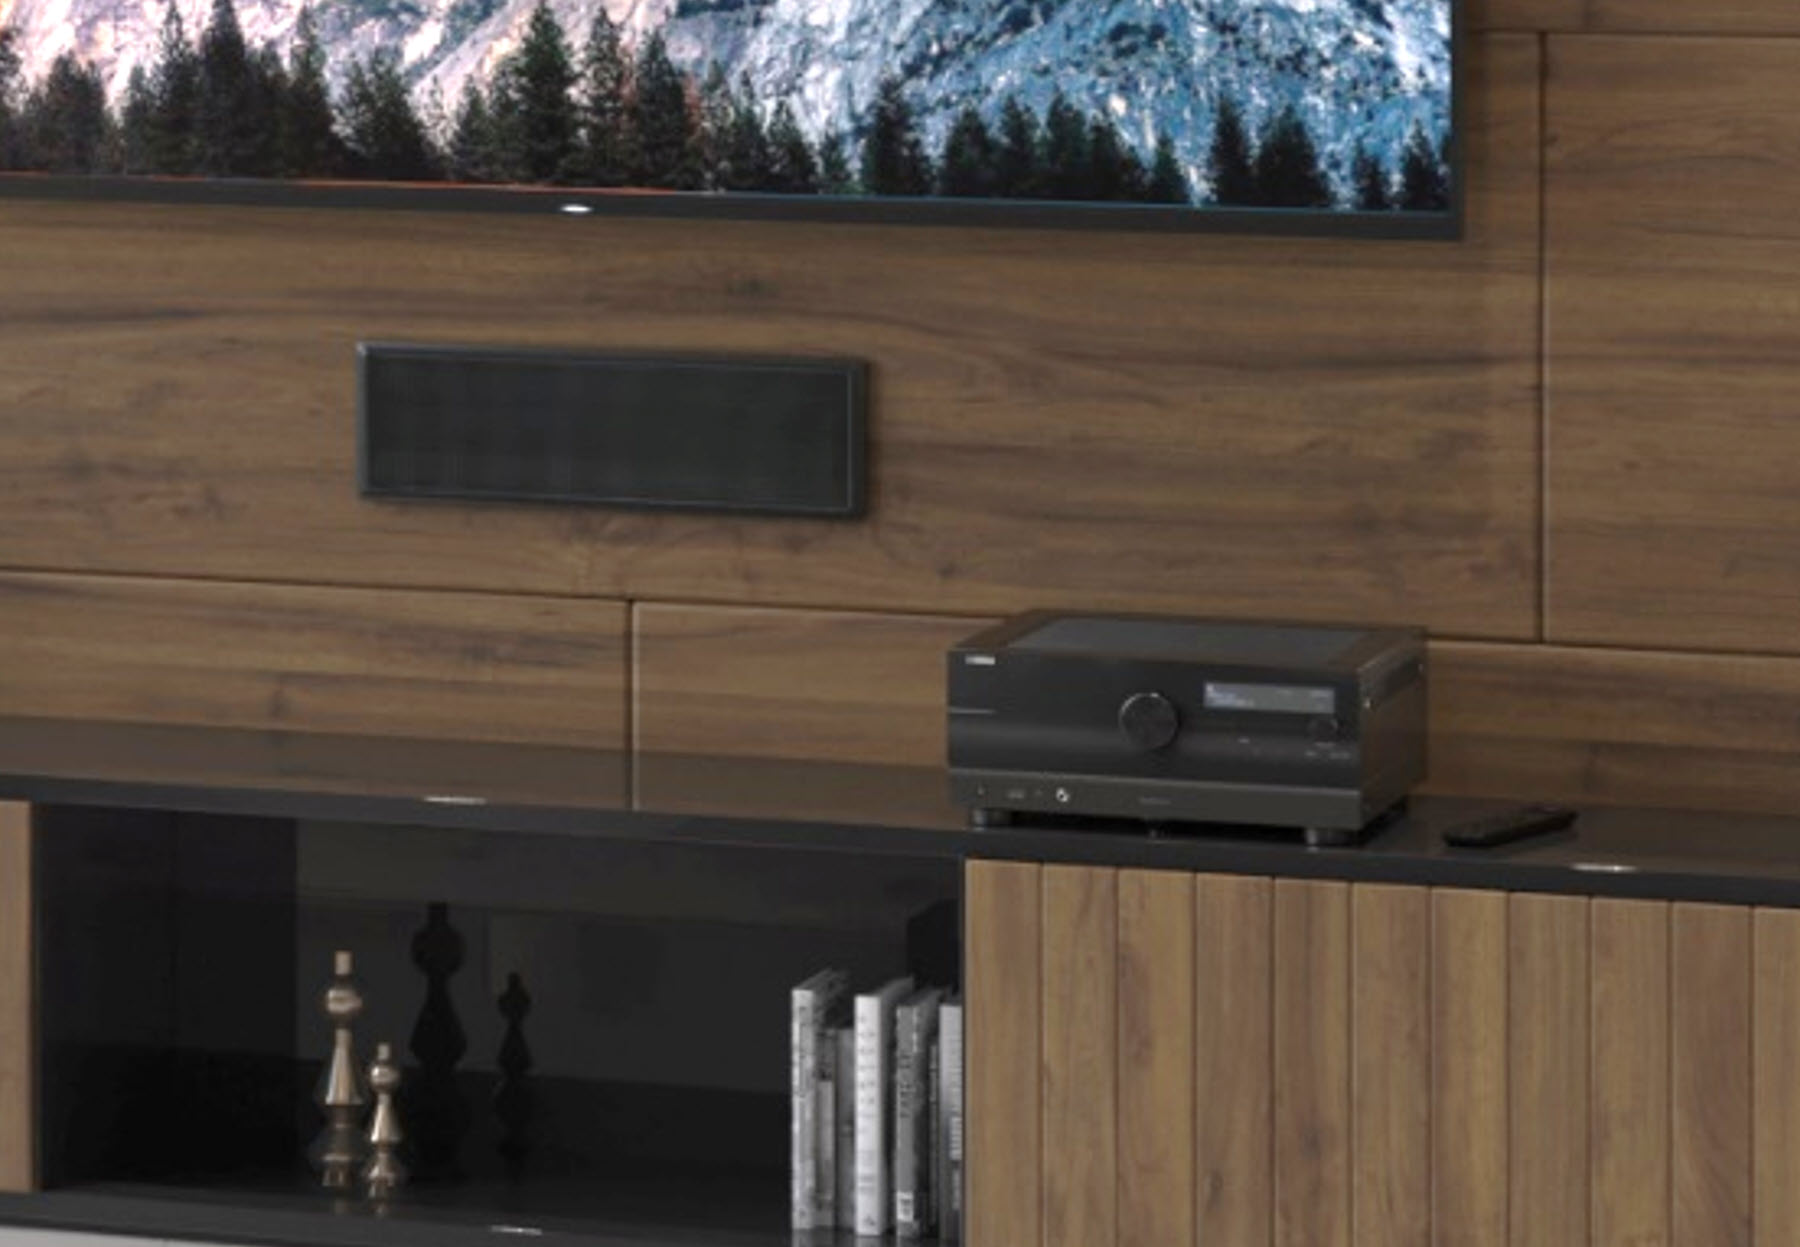 View of unit on shelf below flat screen TV.